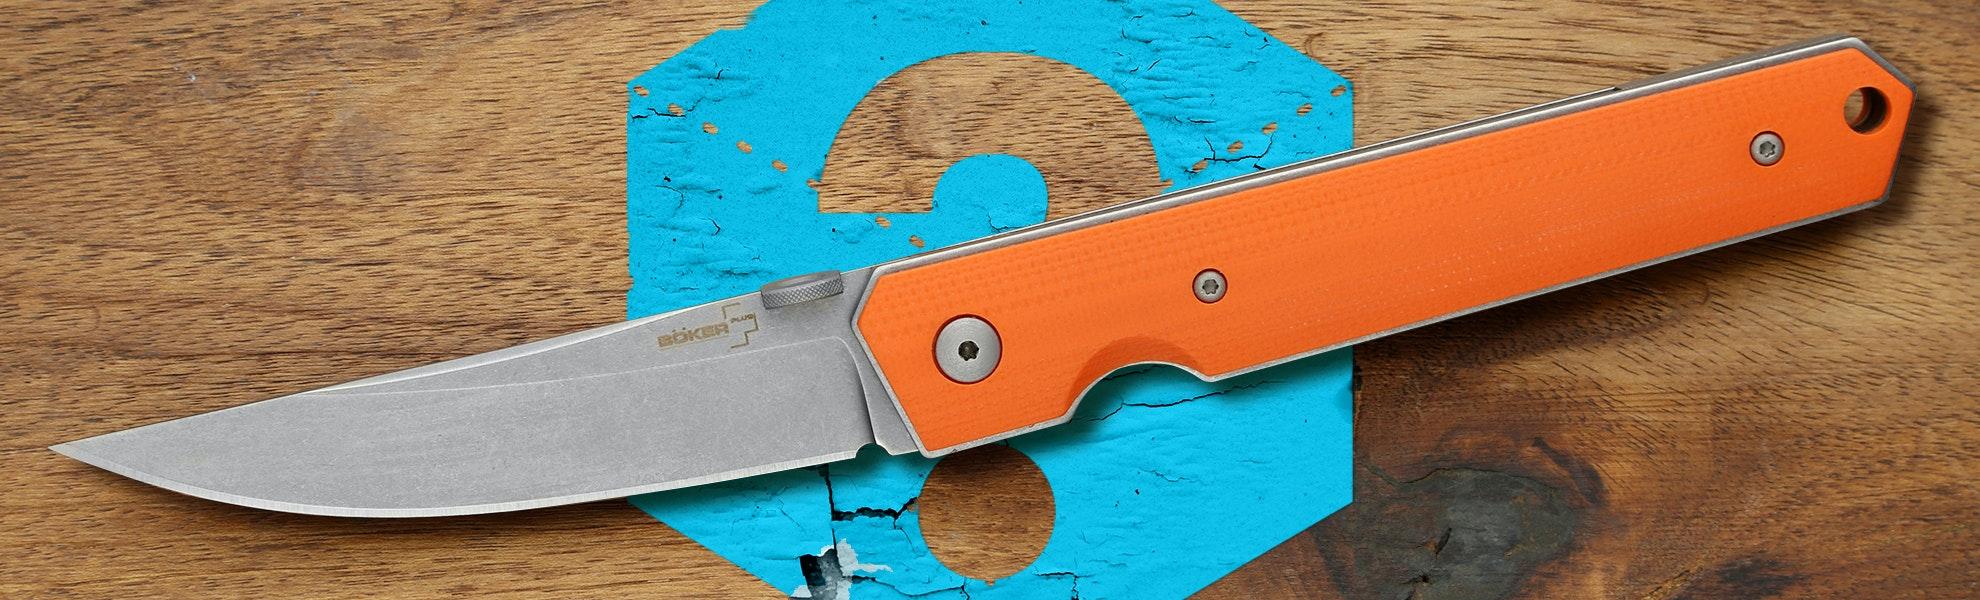 Blue Box: Boker Plus Burnley Kwaiken Folding Knife